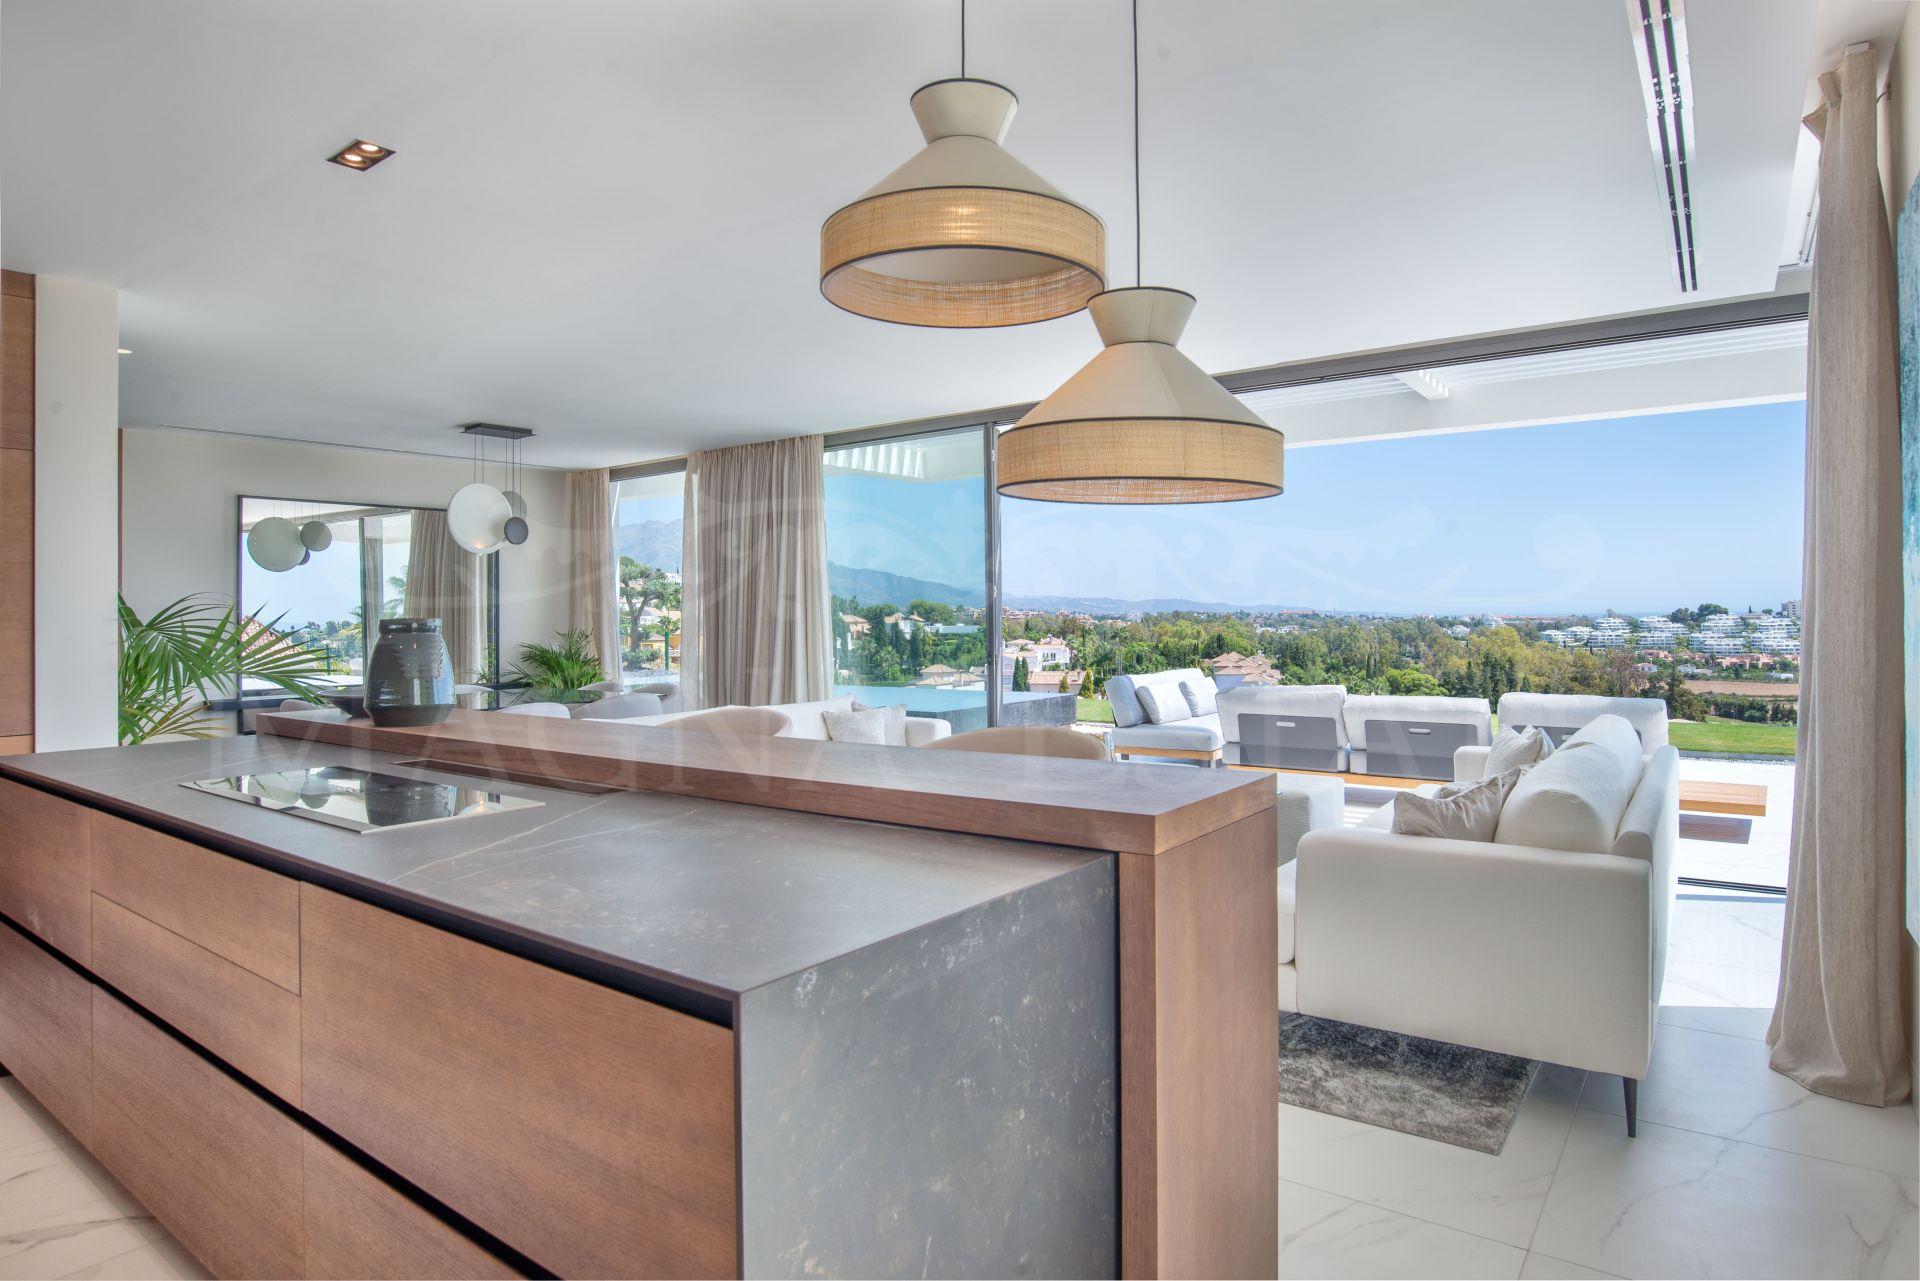 Brand new apartment in Mirador del Paraíso, Benahavís